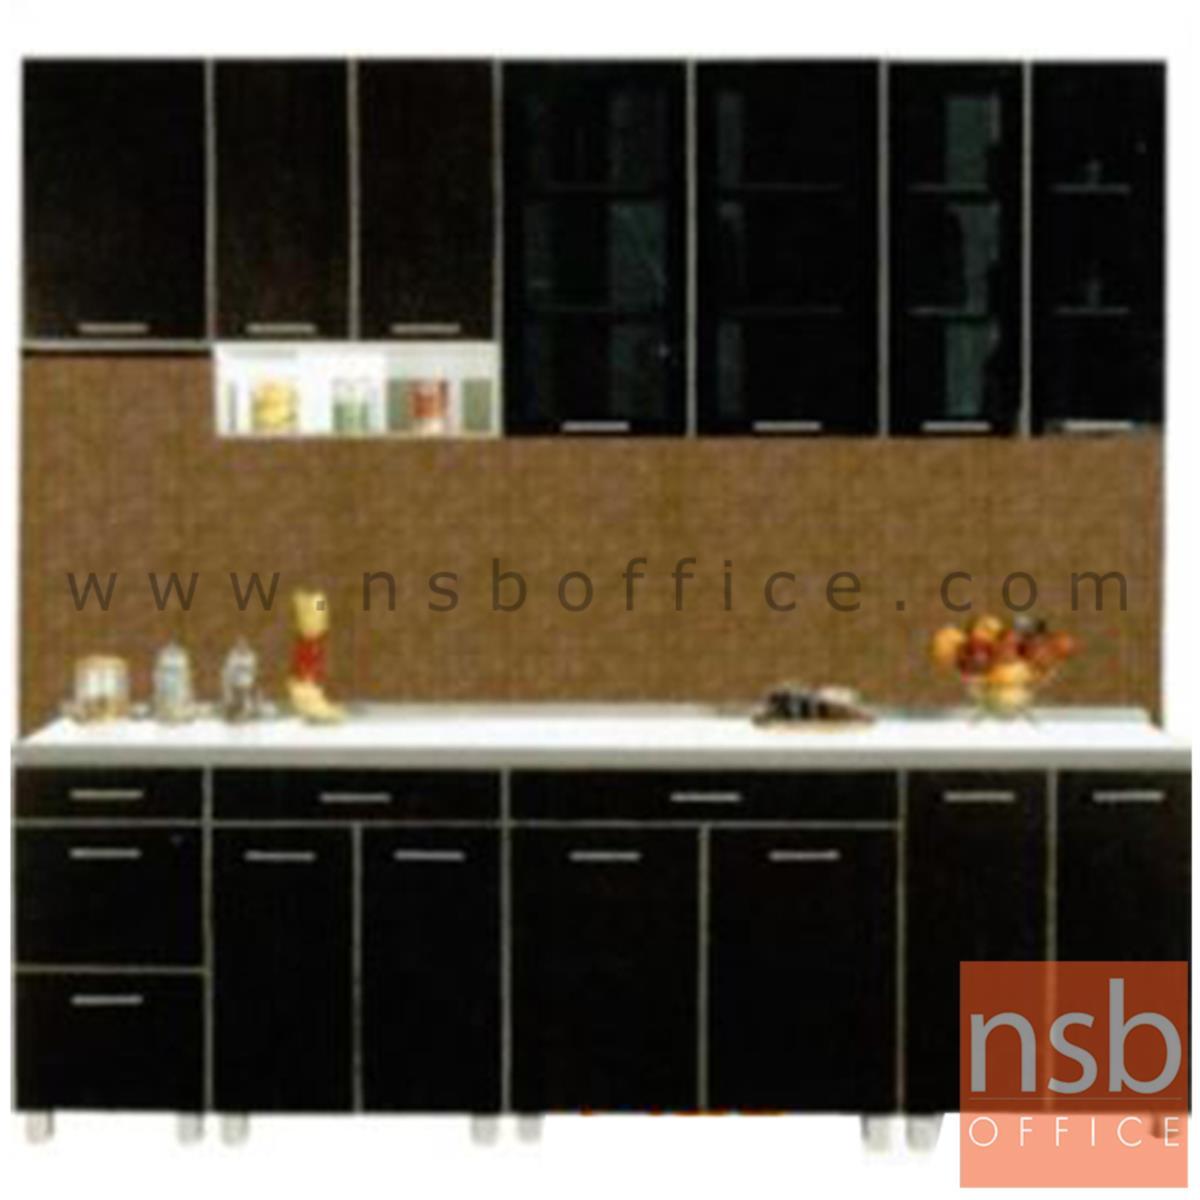 K01A026:ชุดตู้ครัวหน้าเรียบ 240W cm. รุ่น Darigold-240H  พร้อมตู้แขวนลอย